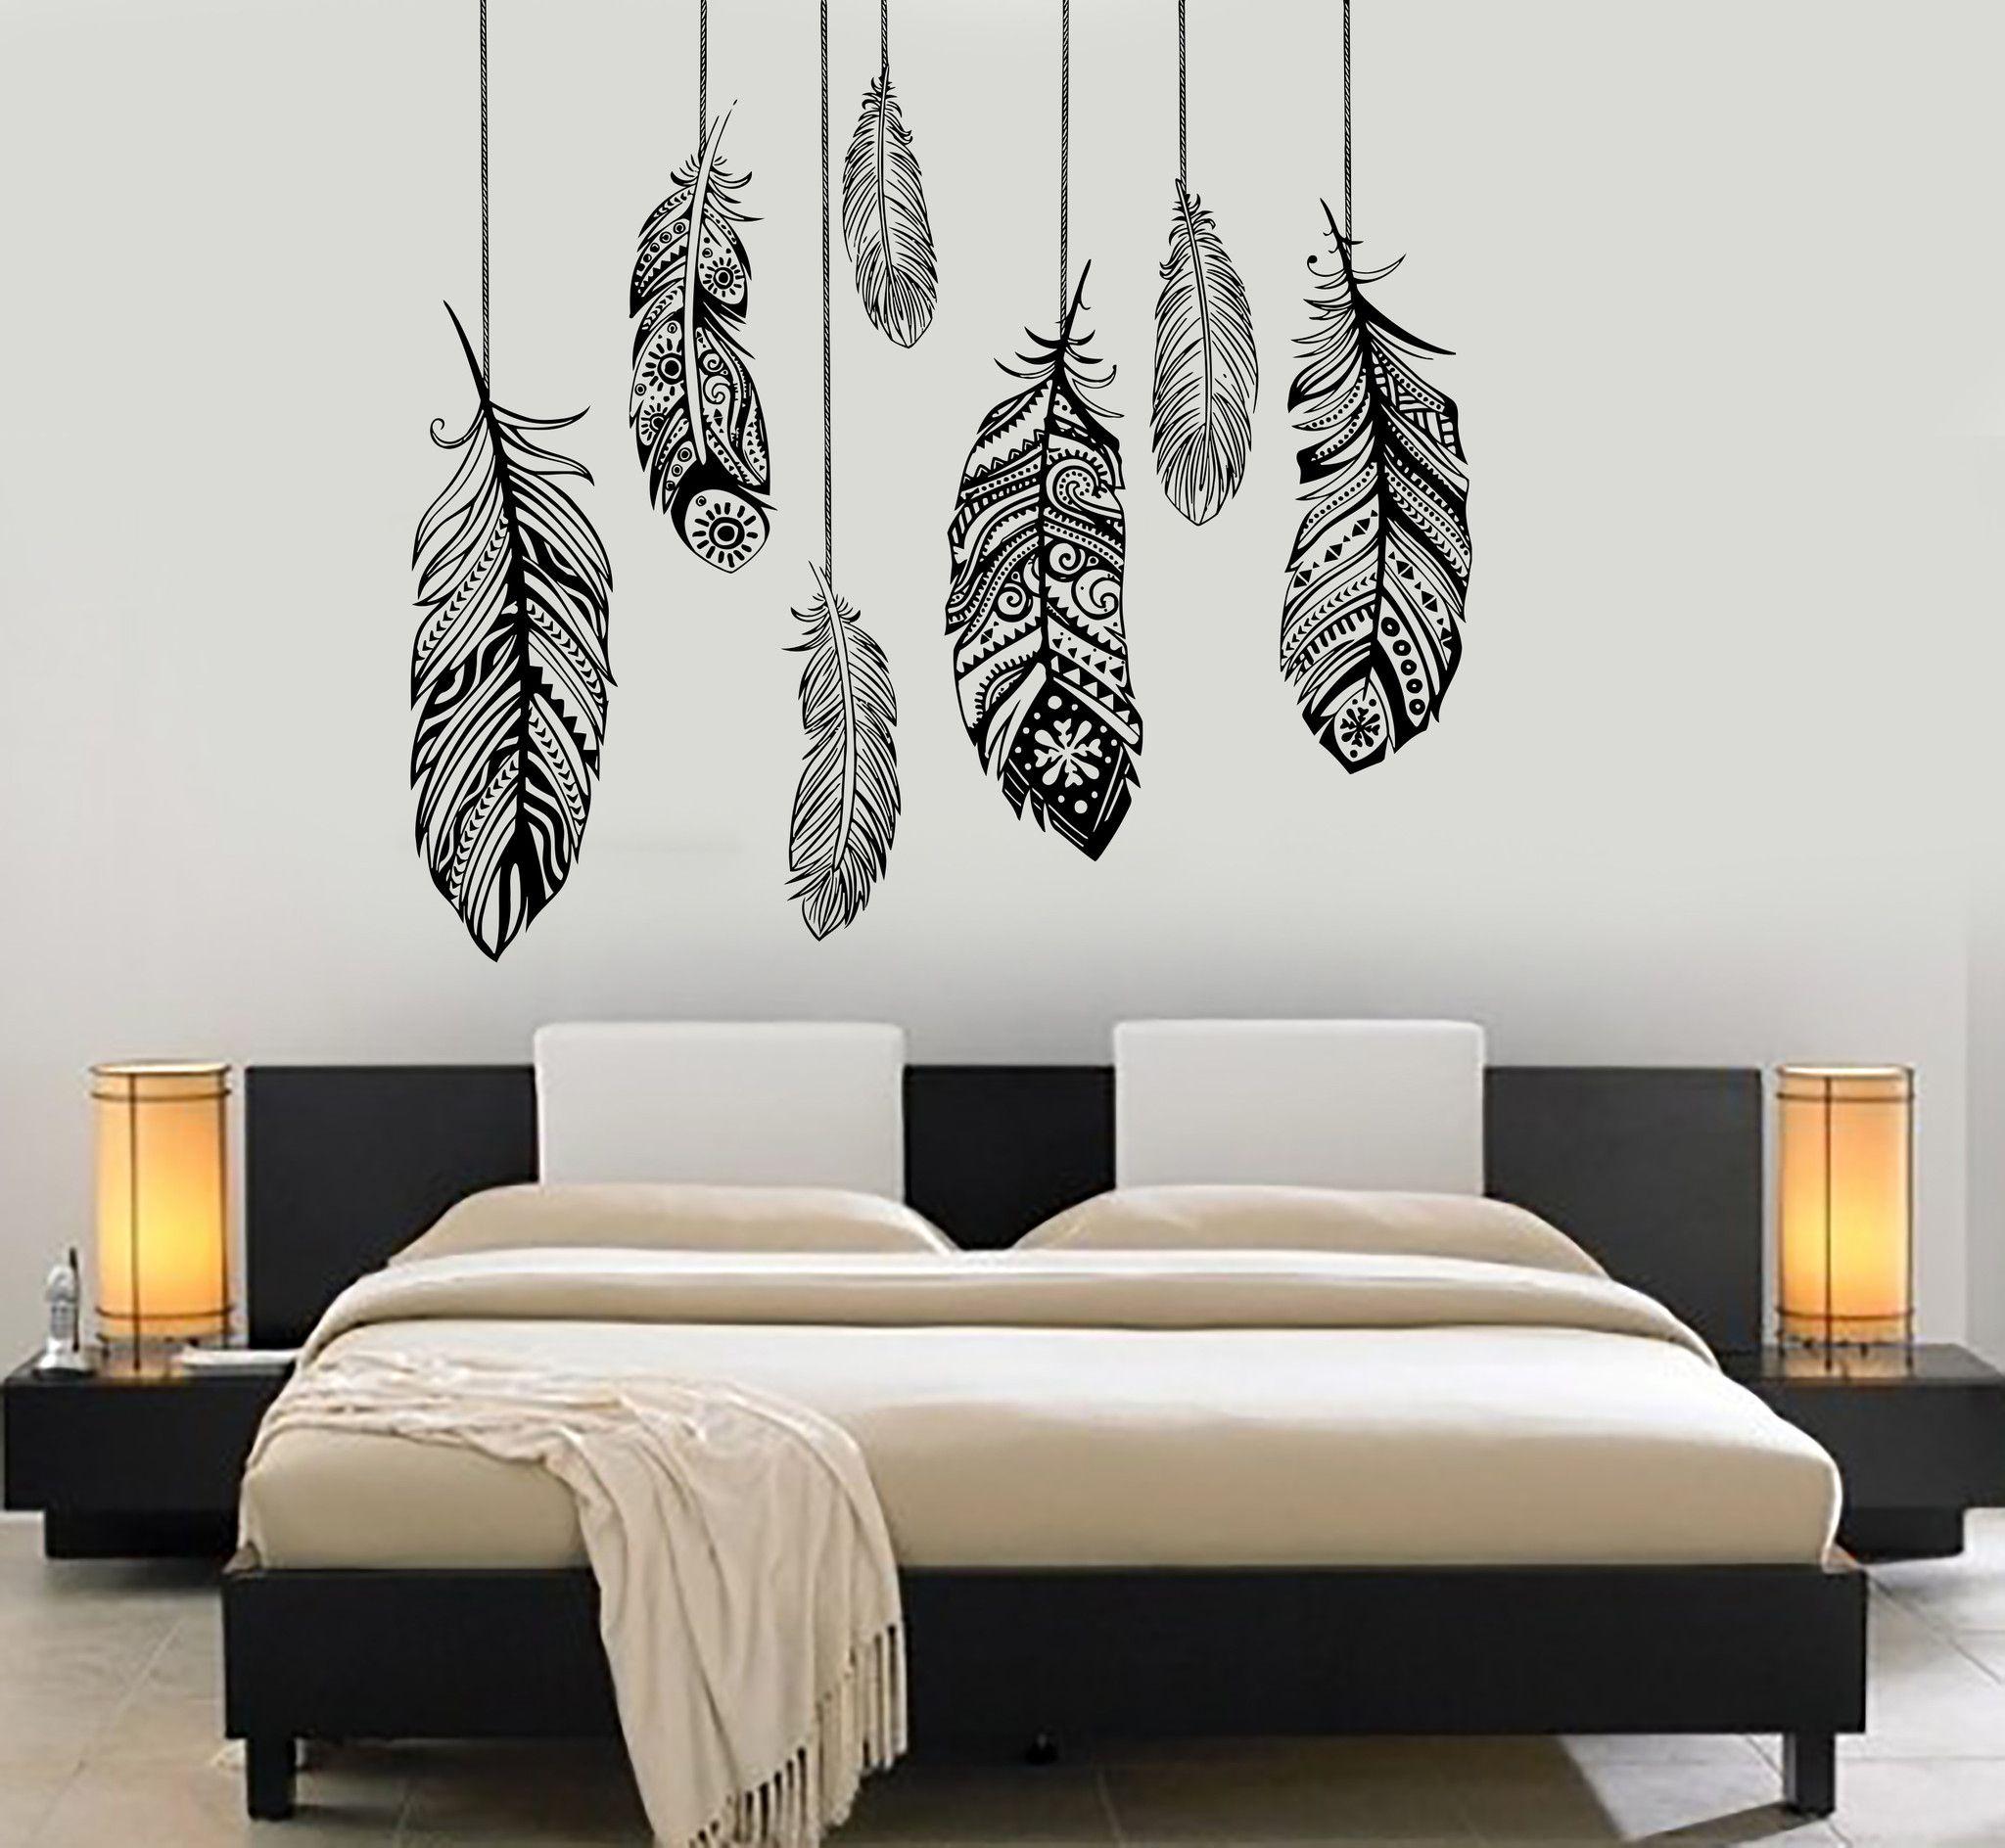 Wall vinyl decal feather romantic bedroom dreamcatcher decor unique